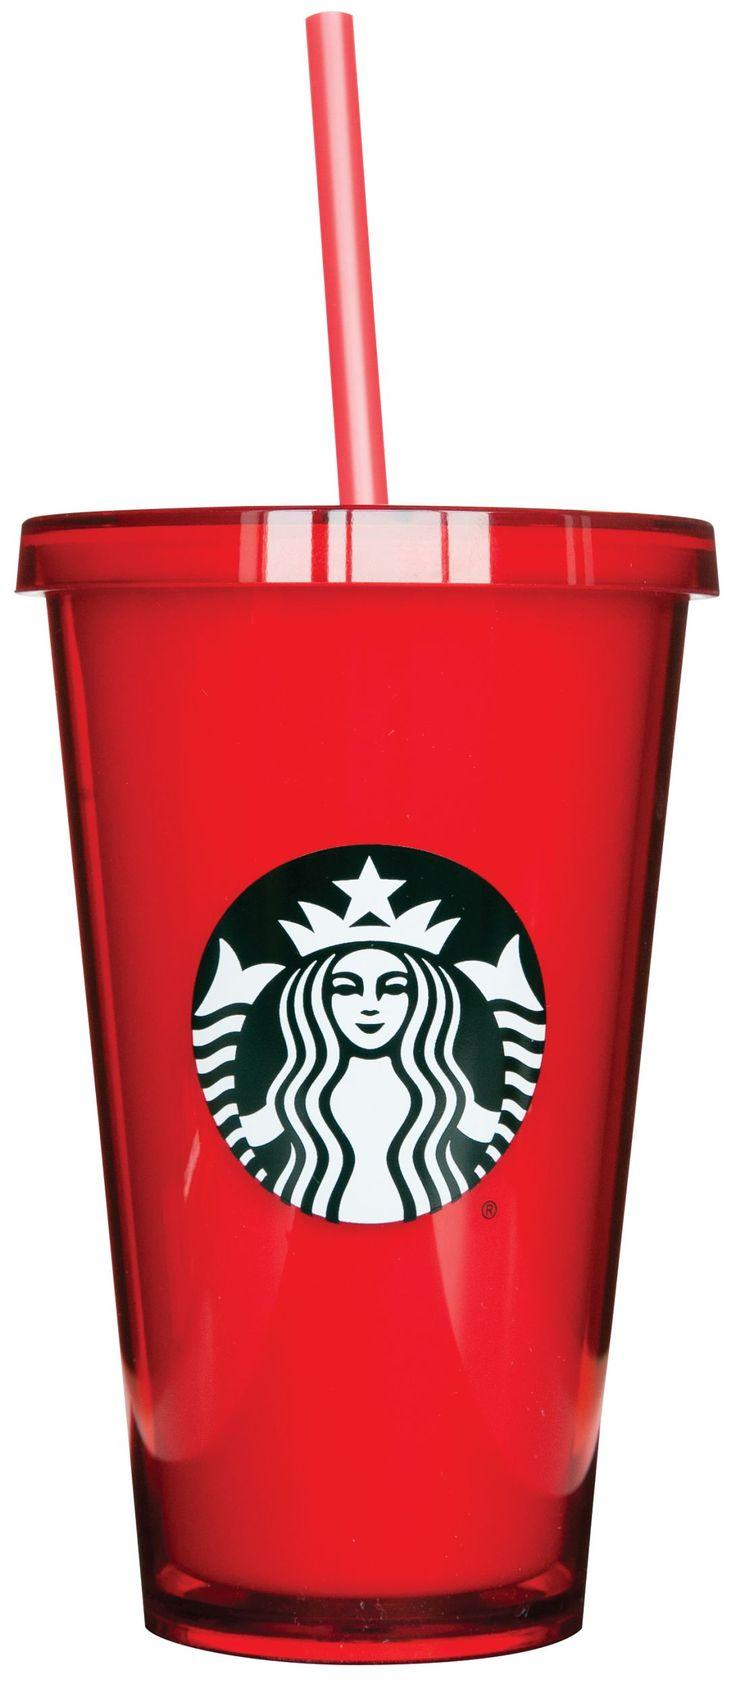 Starbucks Holiday Gift Guide 2017 Drinkware